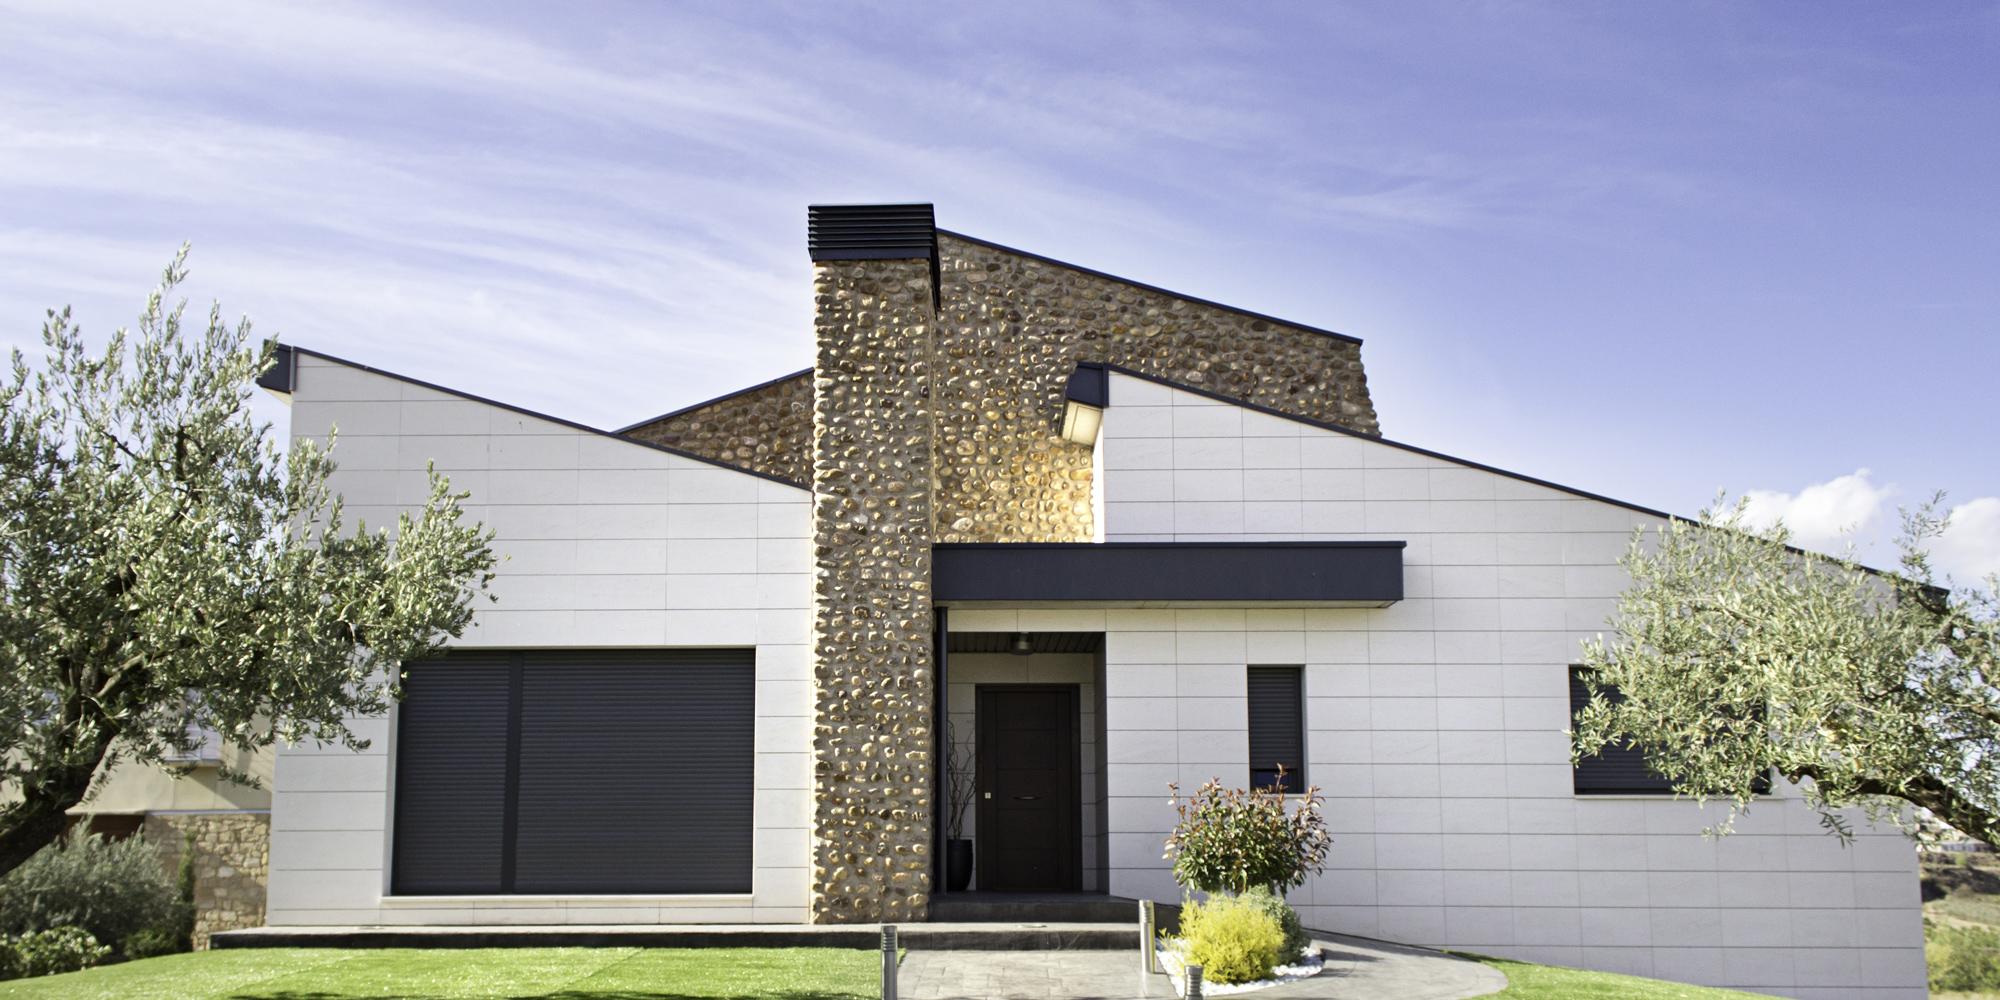 r servoir immo agence immobili re dijon achat et vente. Black Bedroom Furniture Sets. Home Design Ideas